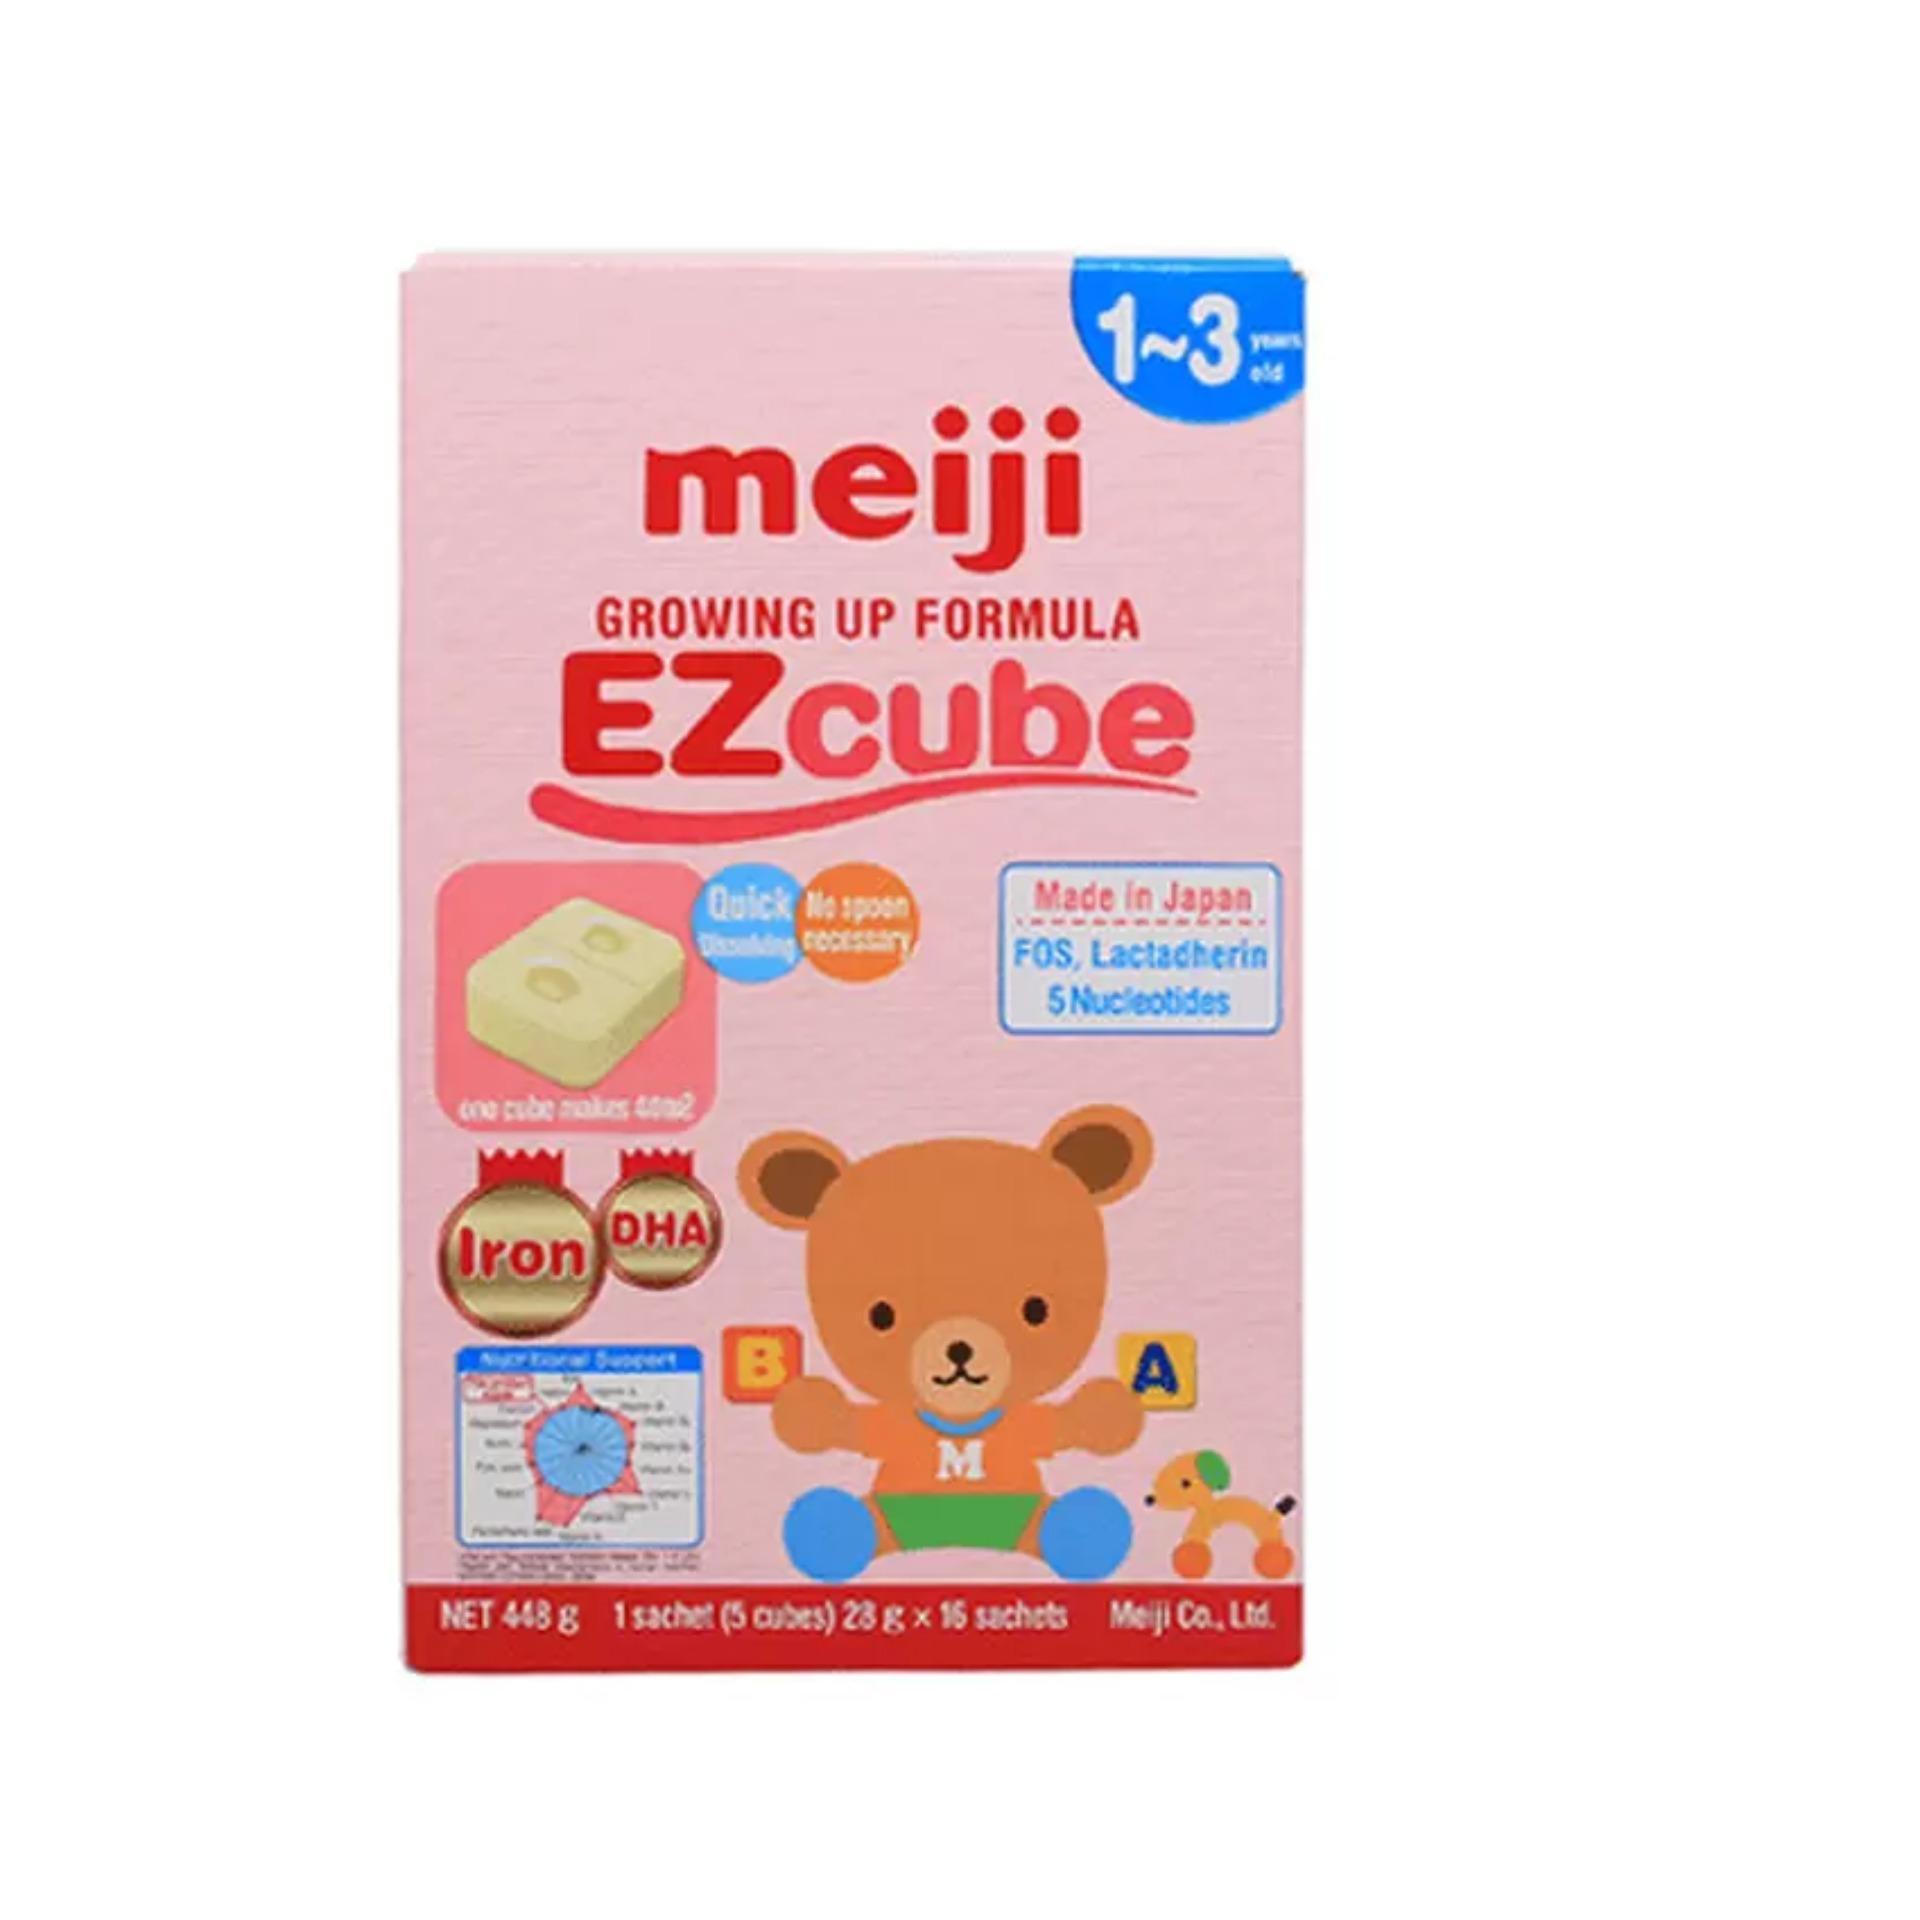 Sữa Meiji thanh (1-3 tuổi) Growing up Formula EZCube (28g x 16 thanh)